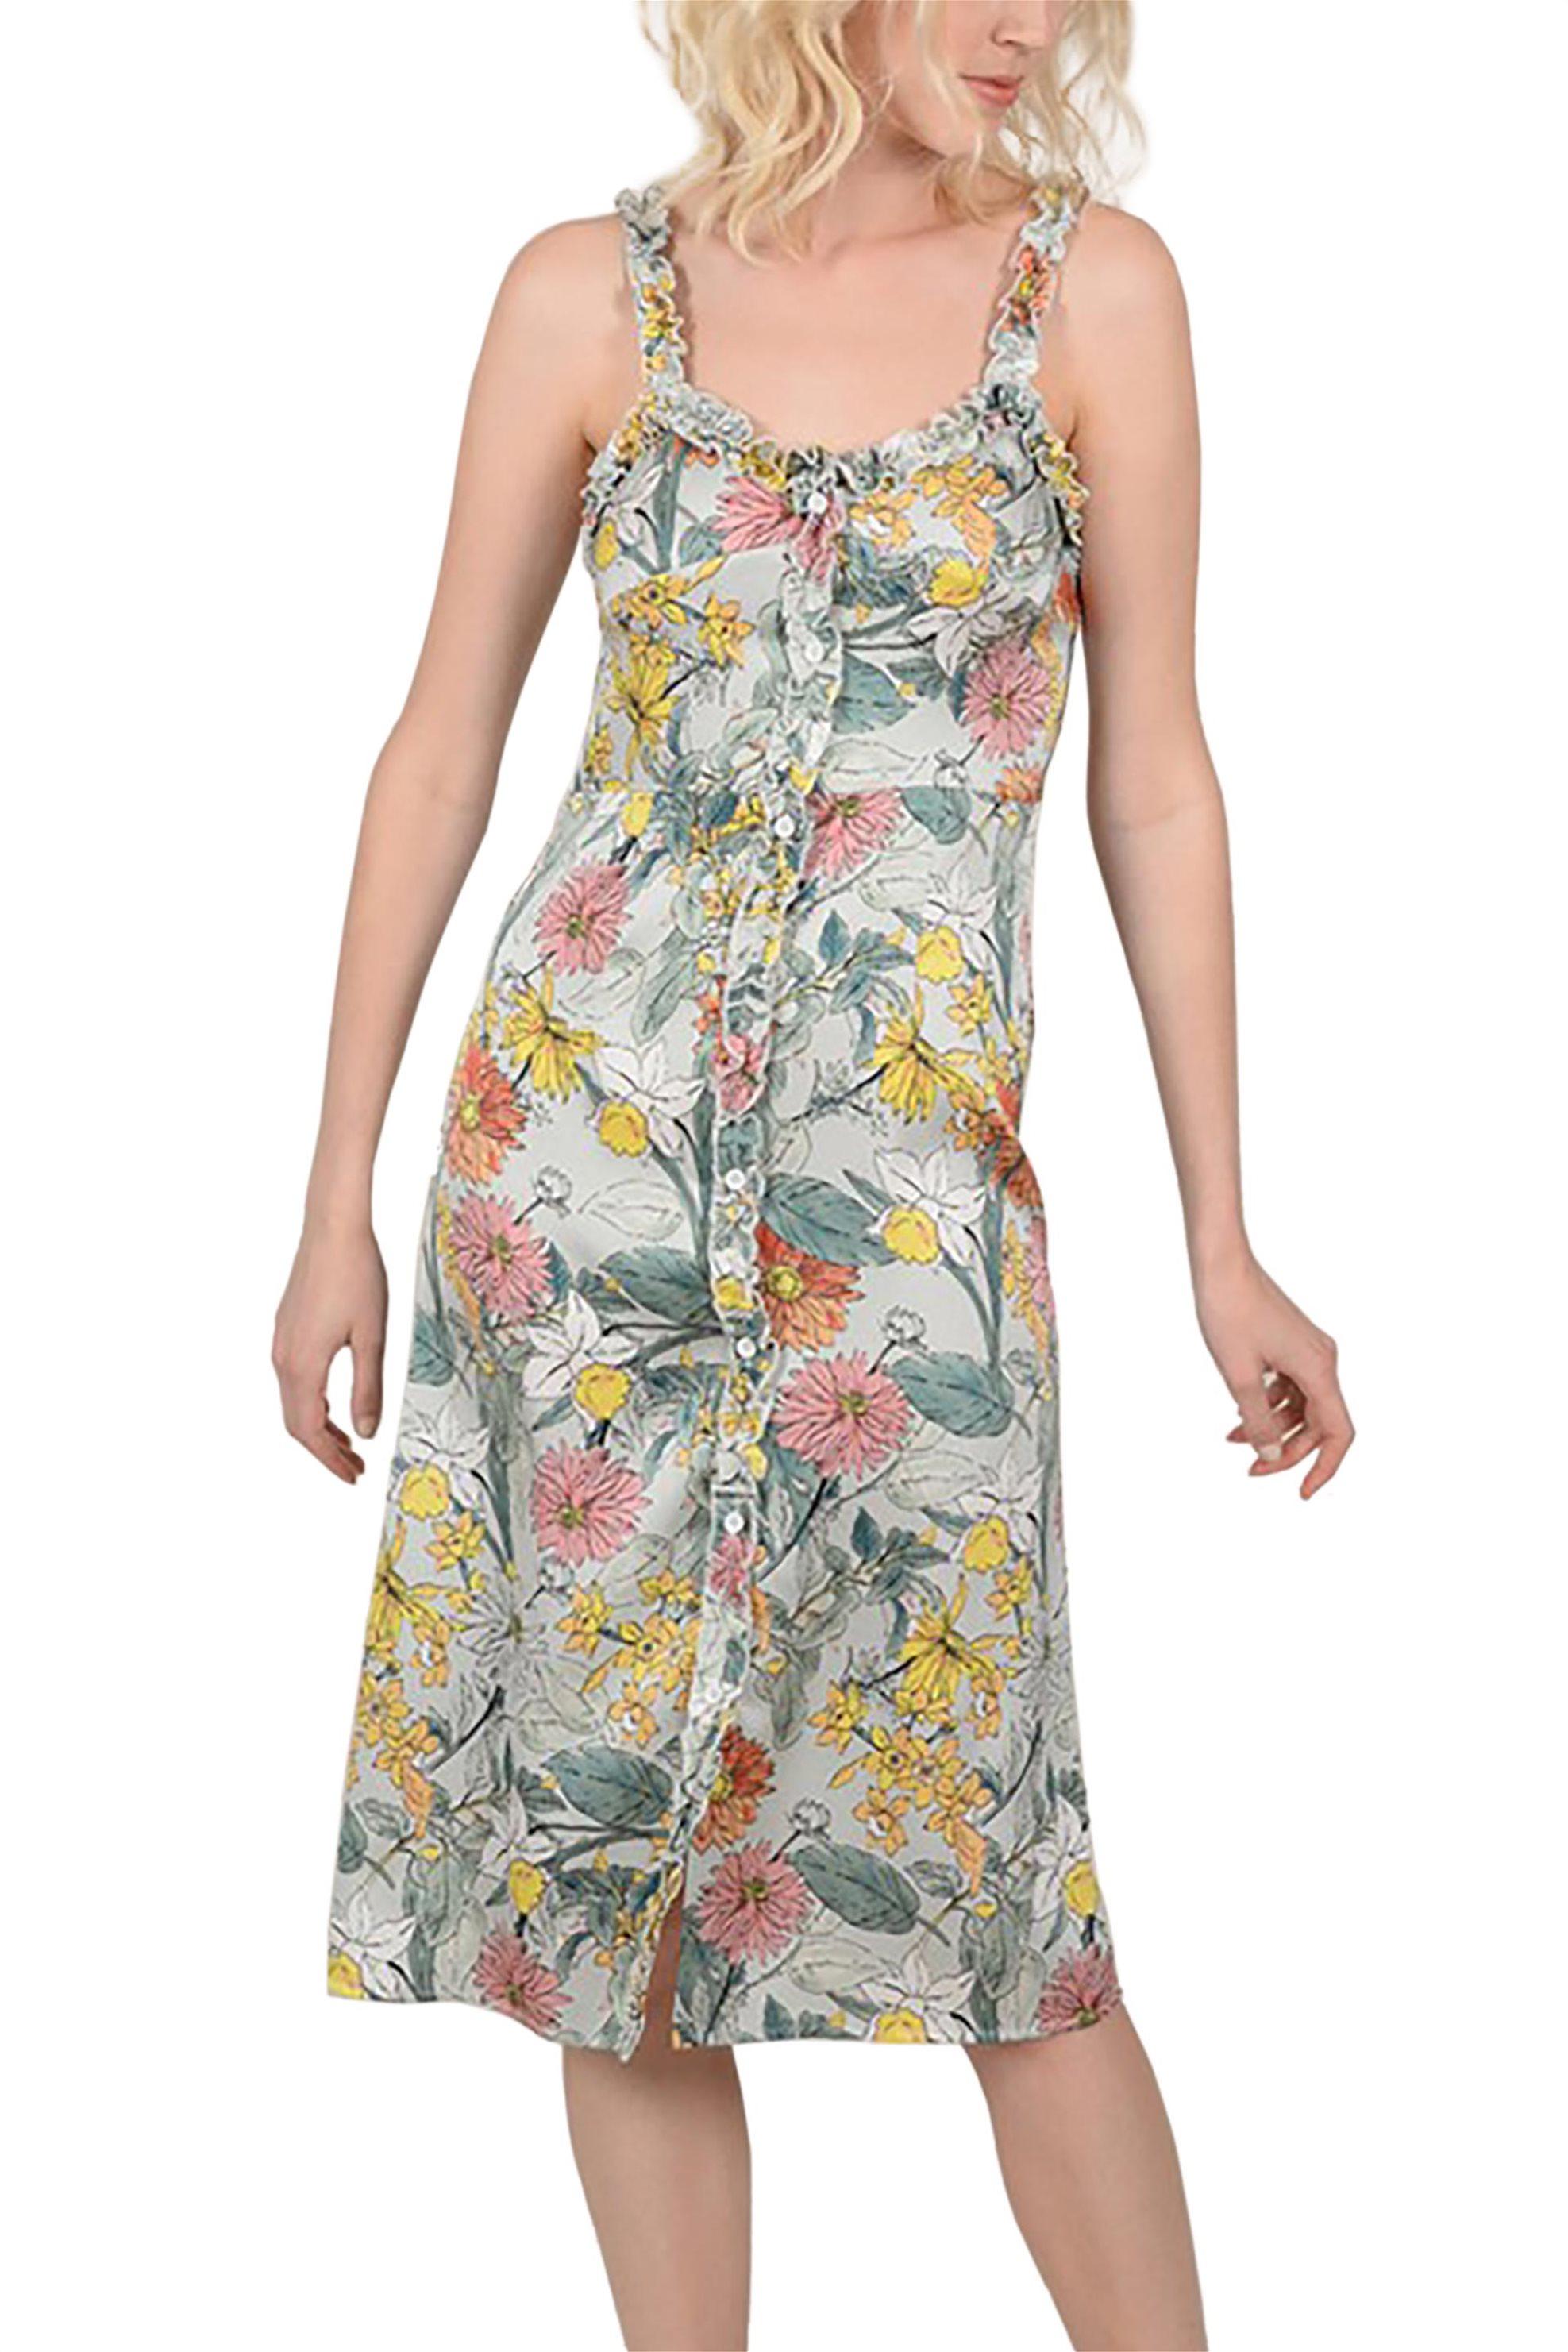 Molly Bracken γυναικείο midi φόρεμα εμπριμέ με βολάν - S19MB-LA249 - Γαλάζιο γυναικα   ρουχα   φορέματα   midi φορέματα